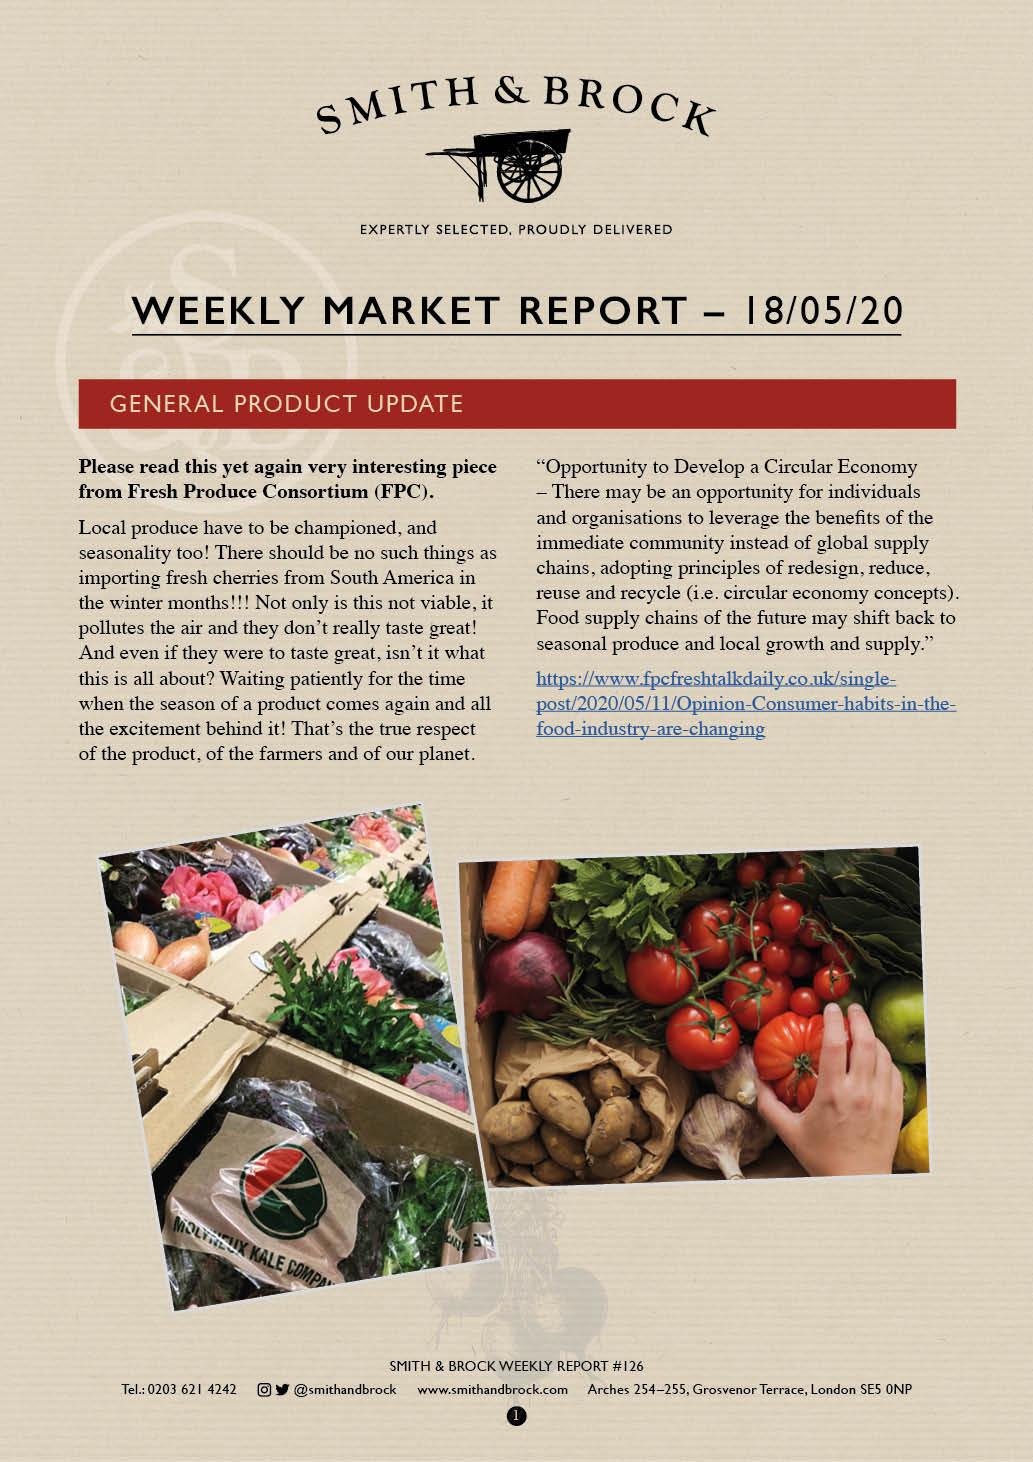 Smith&Brock Market Report 18 may 2020 126